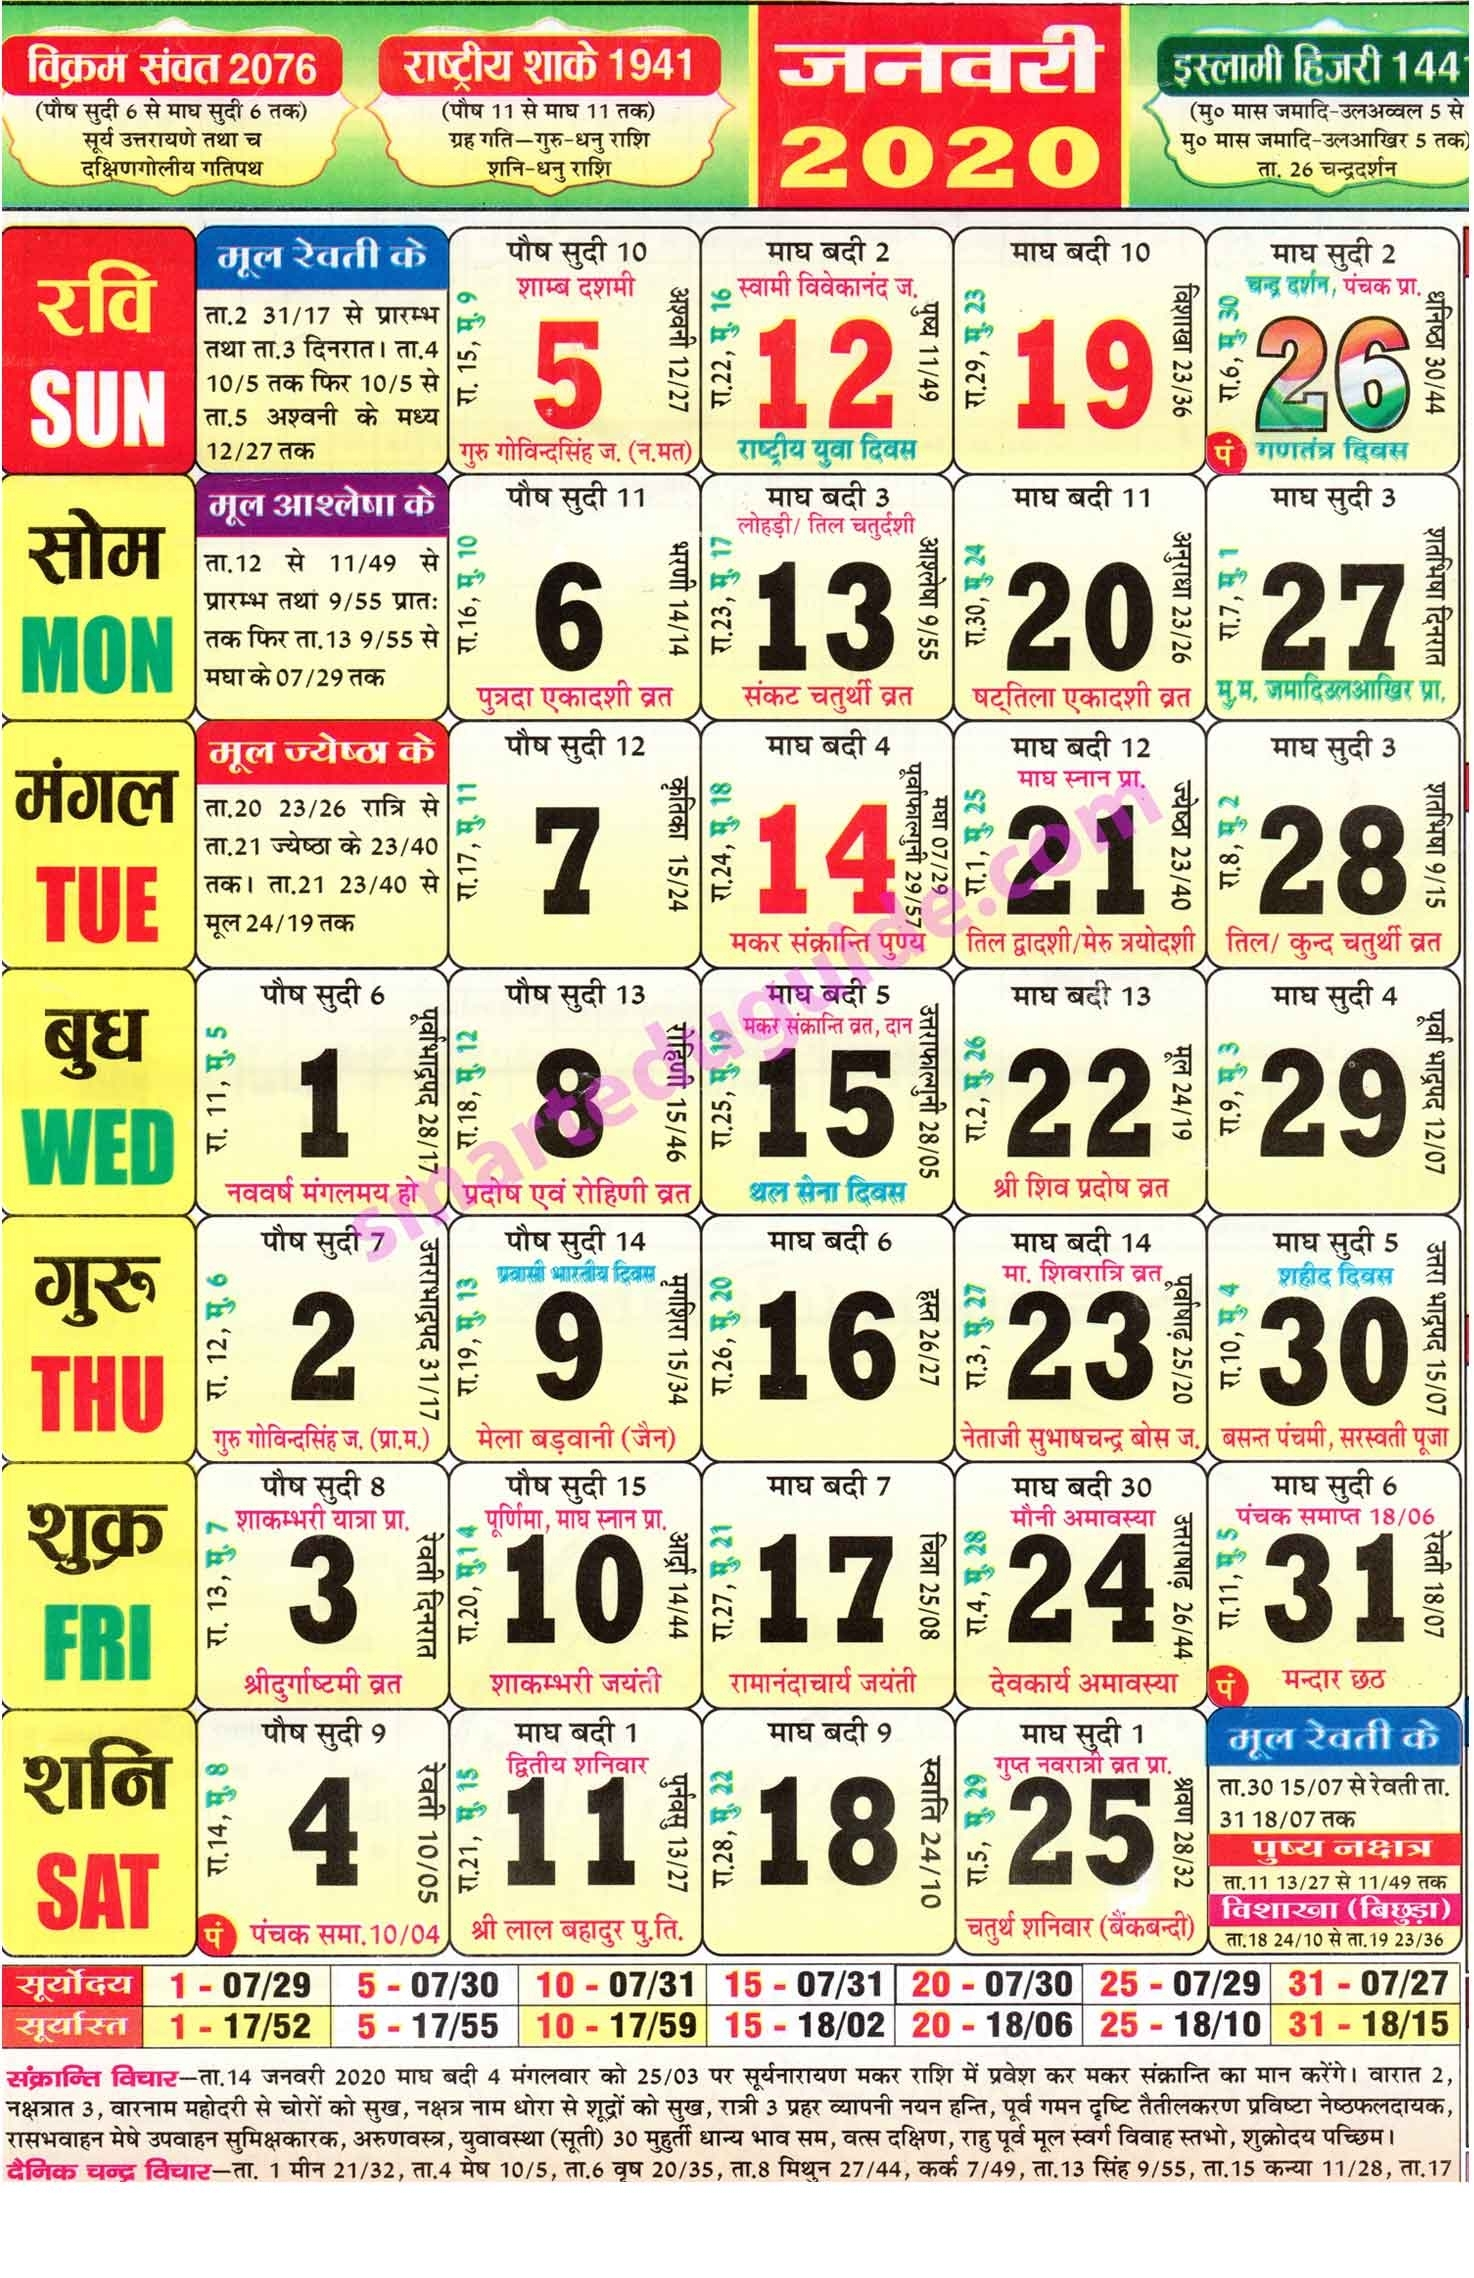 Thakur Prasad Calendar 2020 In Hindi Pdf Free Download | Seg